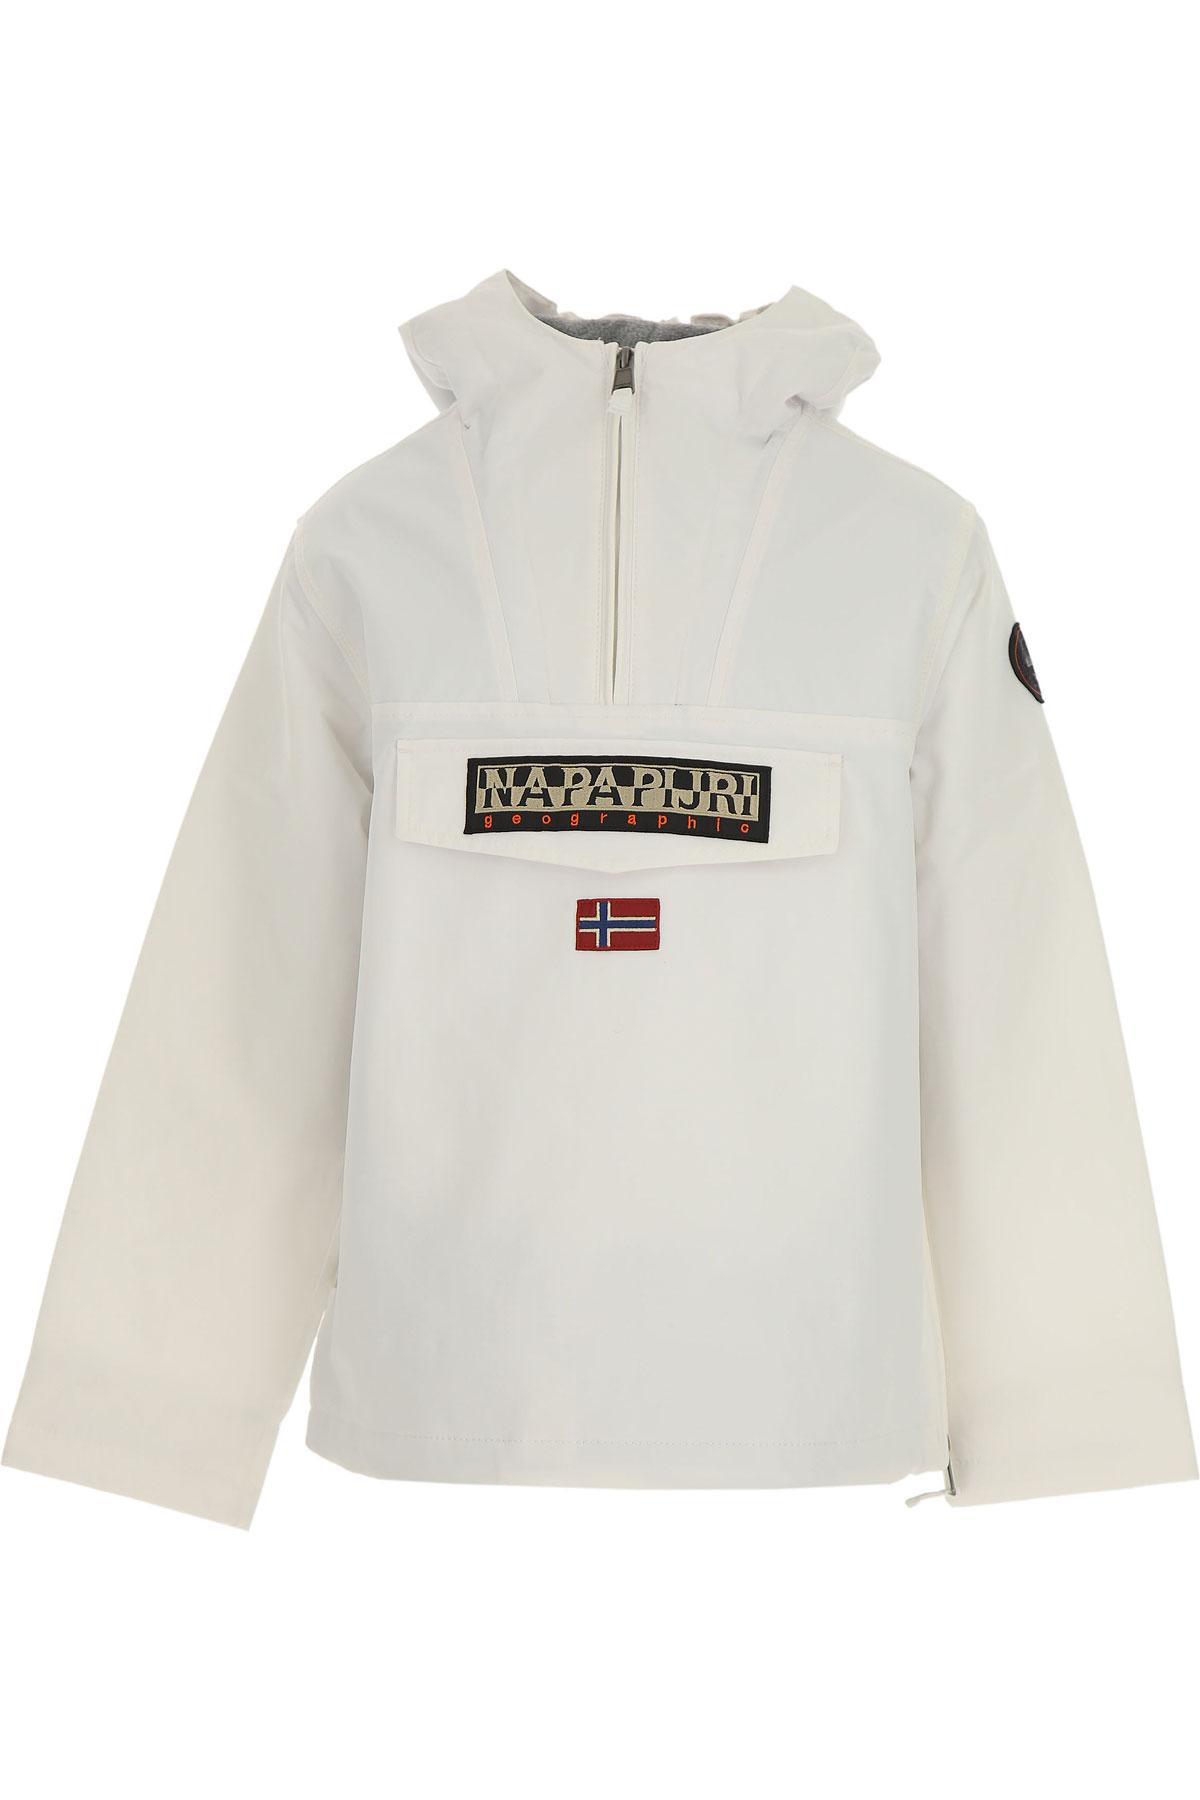 Napapijri Kids Jacket for Boys On Sale, White, polyester, 2019, 10Y 12Y 14Y